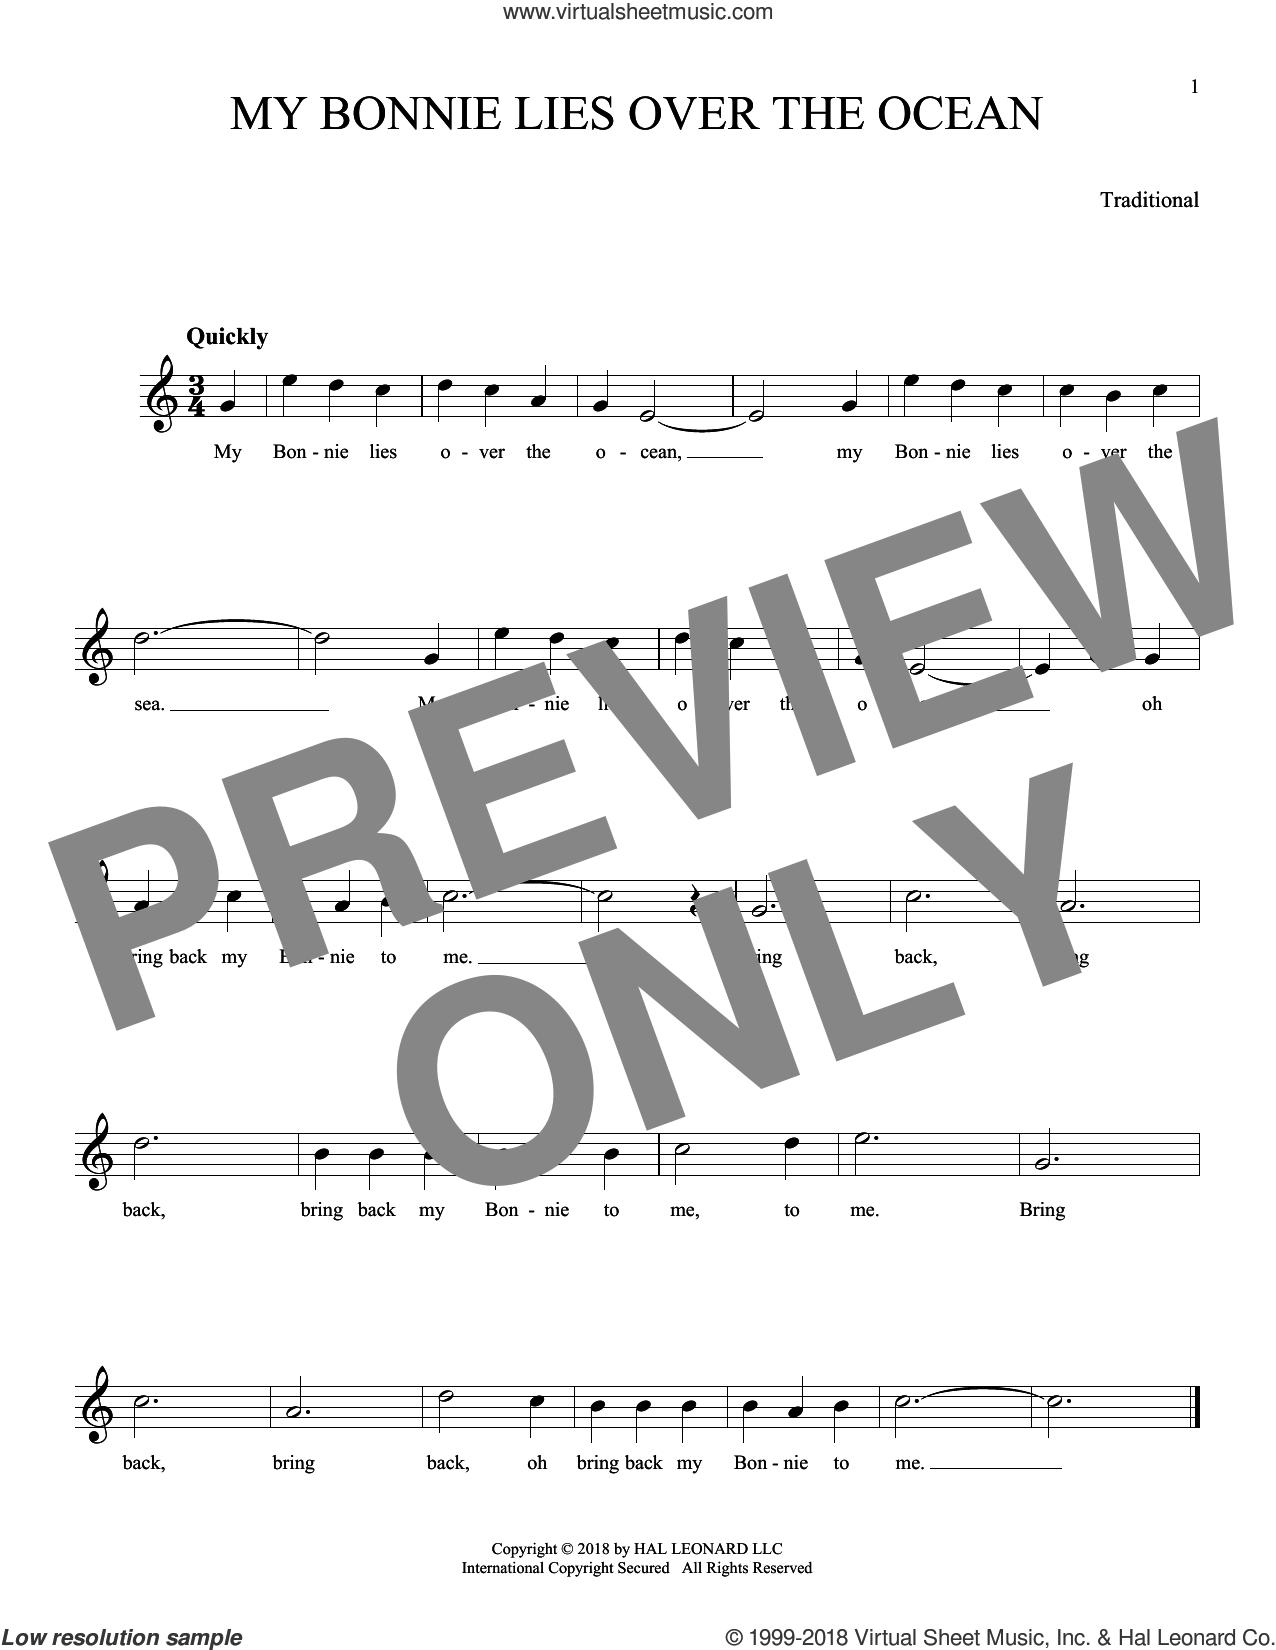 My Bonnie Lies Over The Ocean sheet music for ocarina solo, intermediate skill level